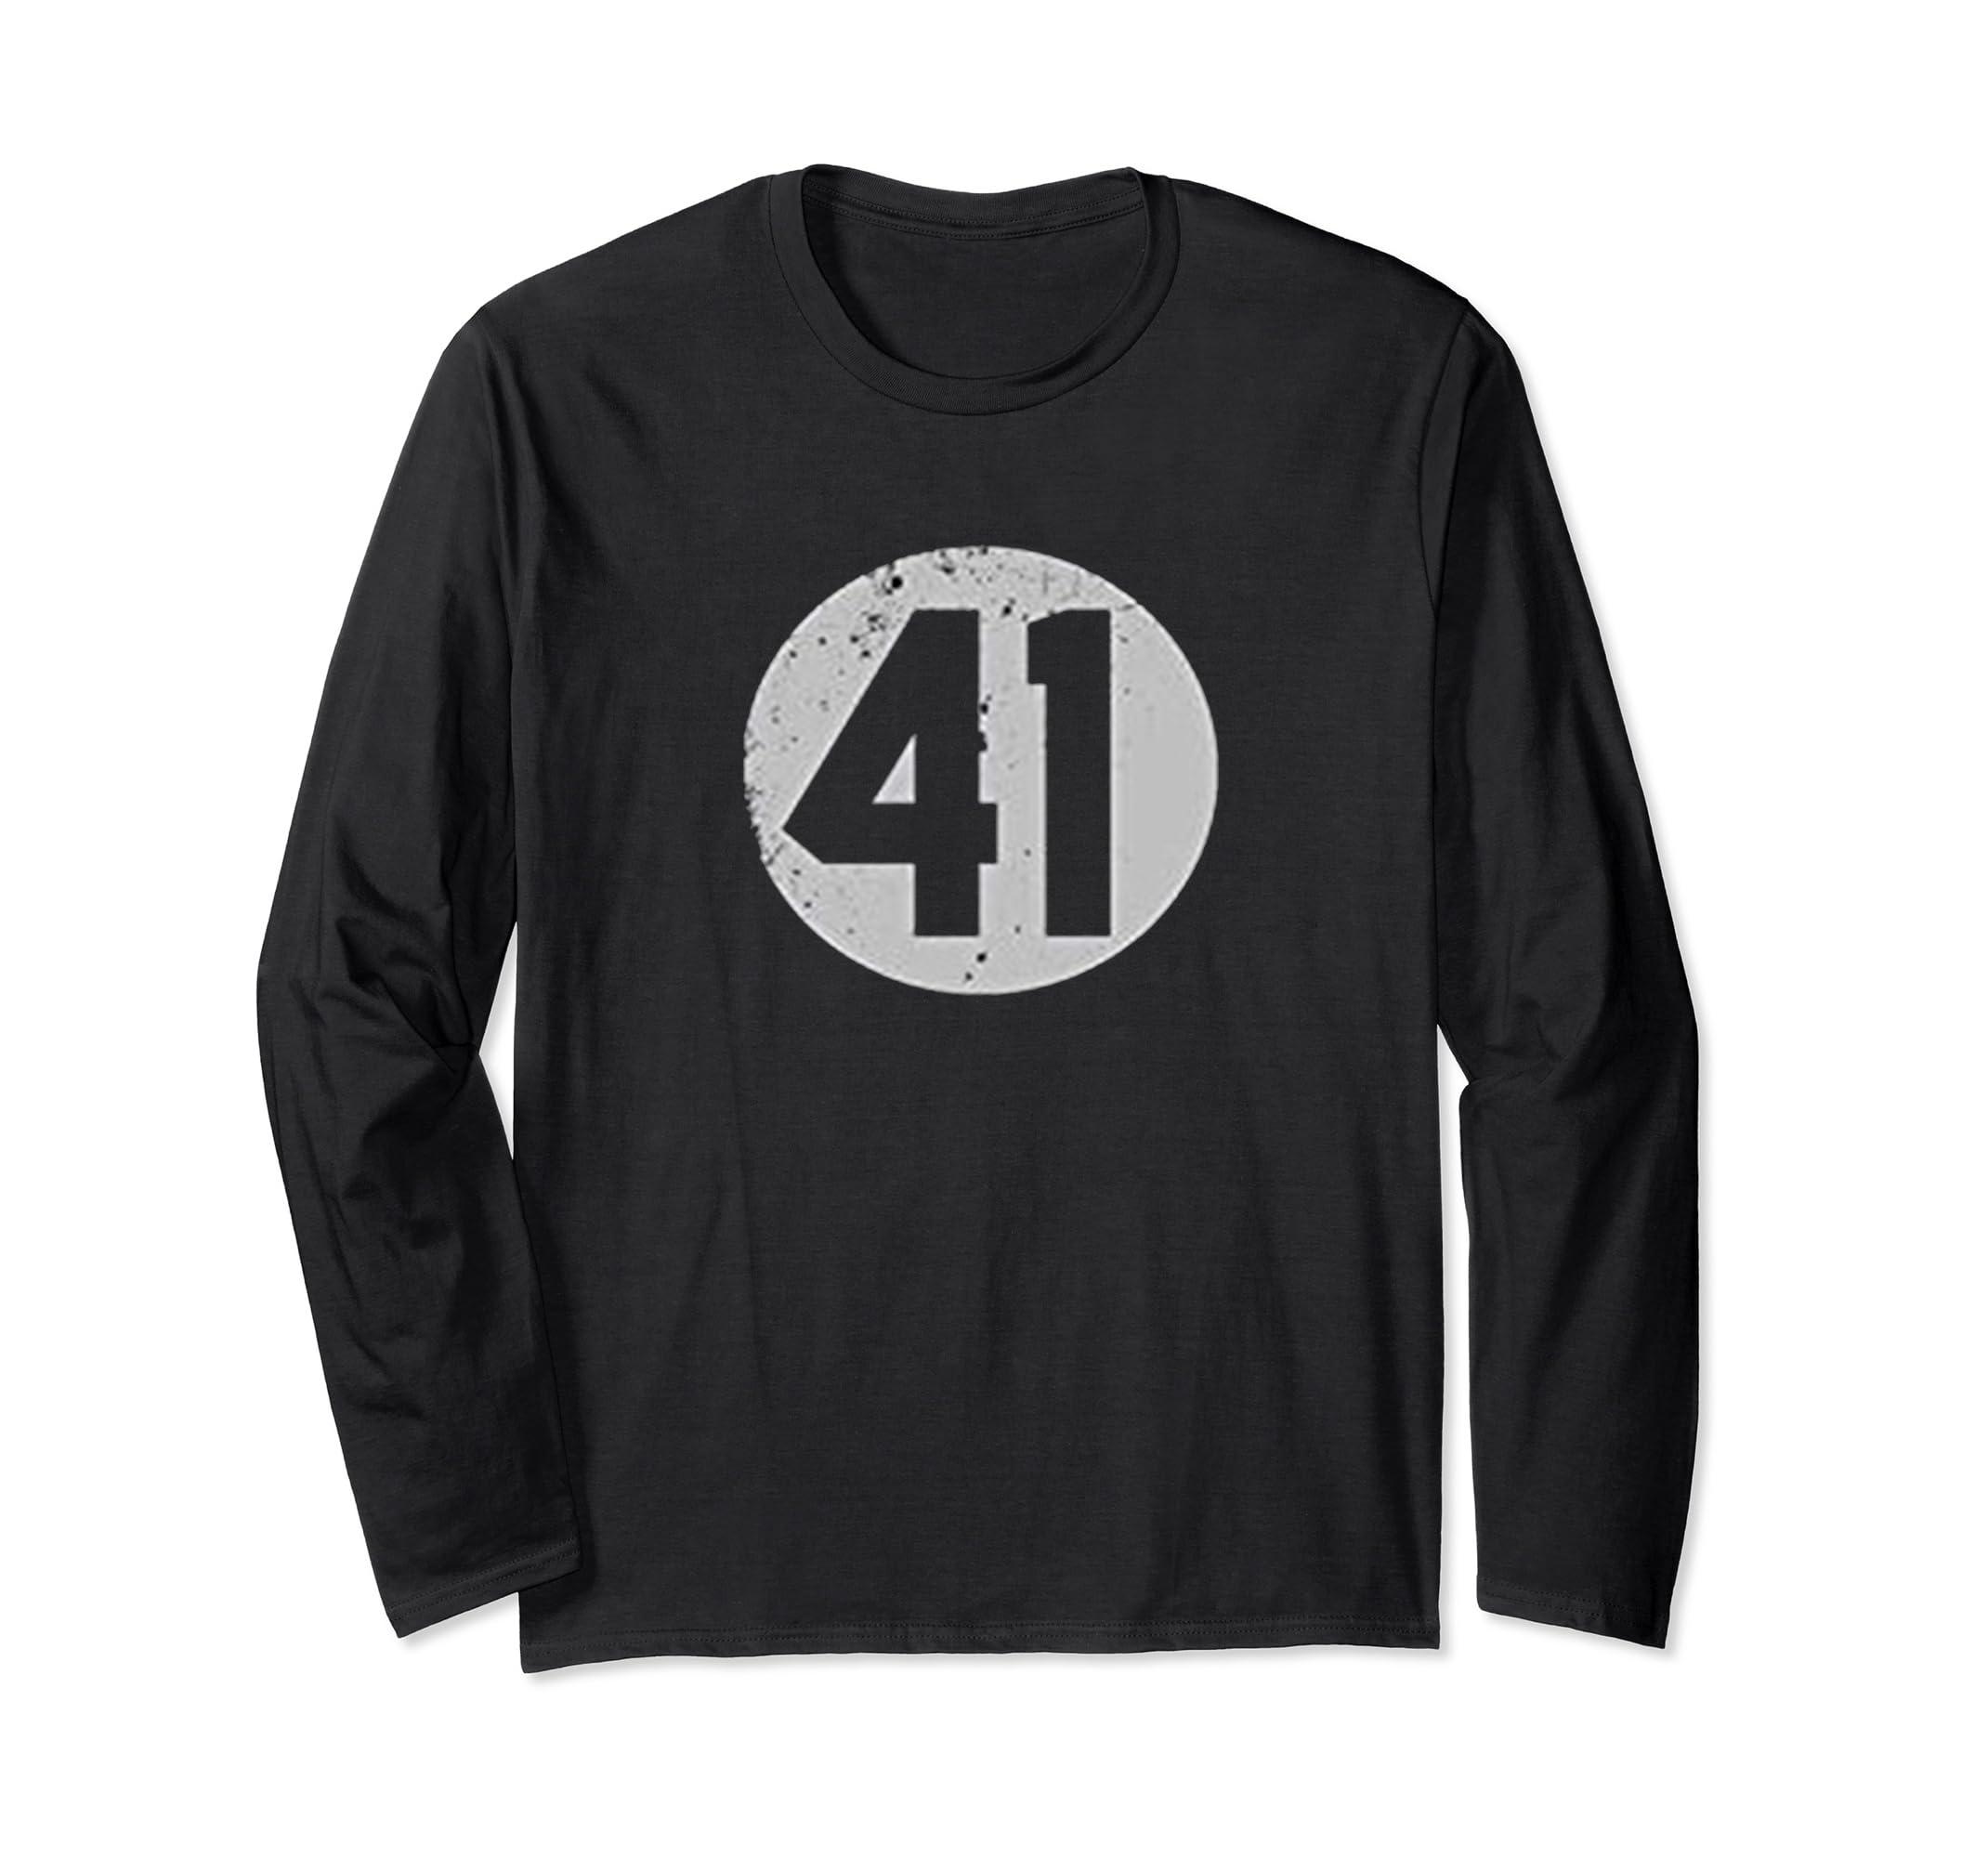 #41   Long Sleeve   for everyone likenit-ln